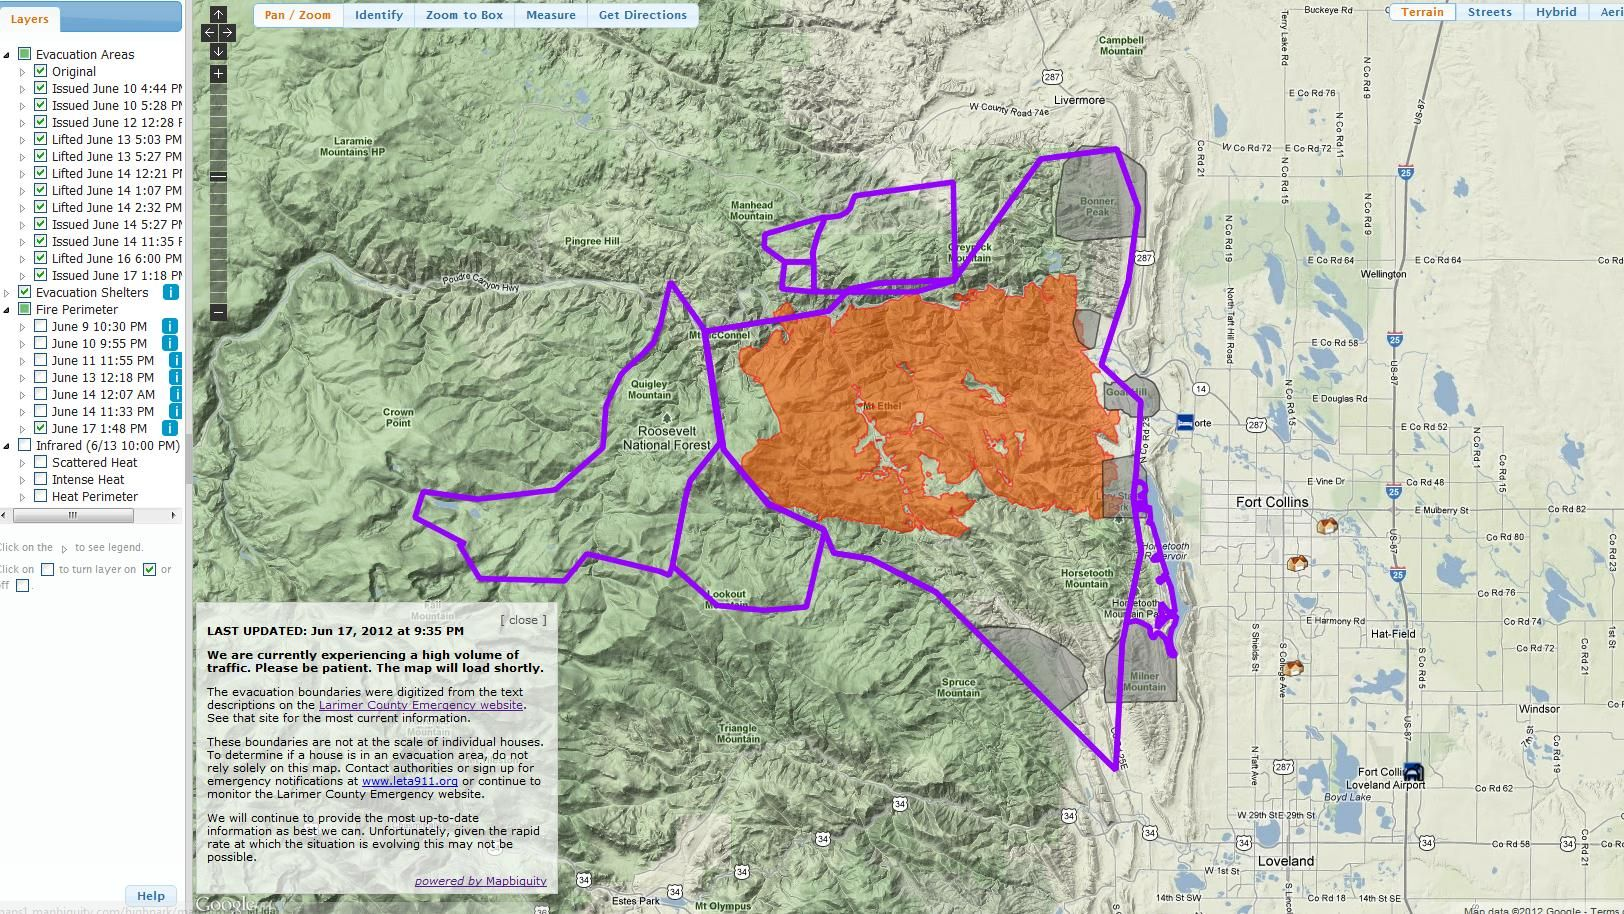 High Park Fire Map.High Park Fire Map Snapshot Maps And Charts Map Park Fire